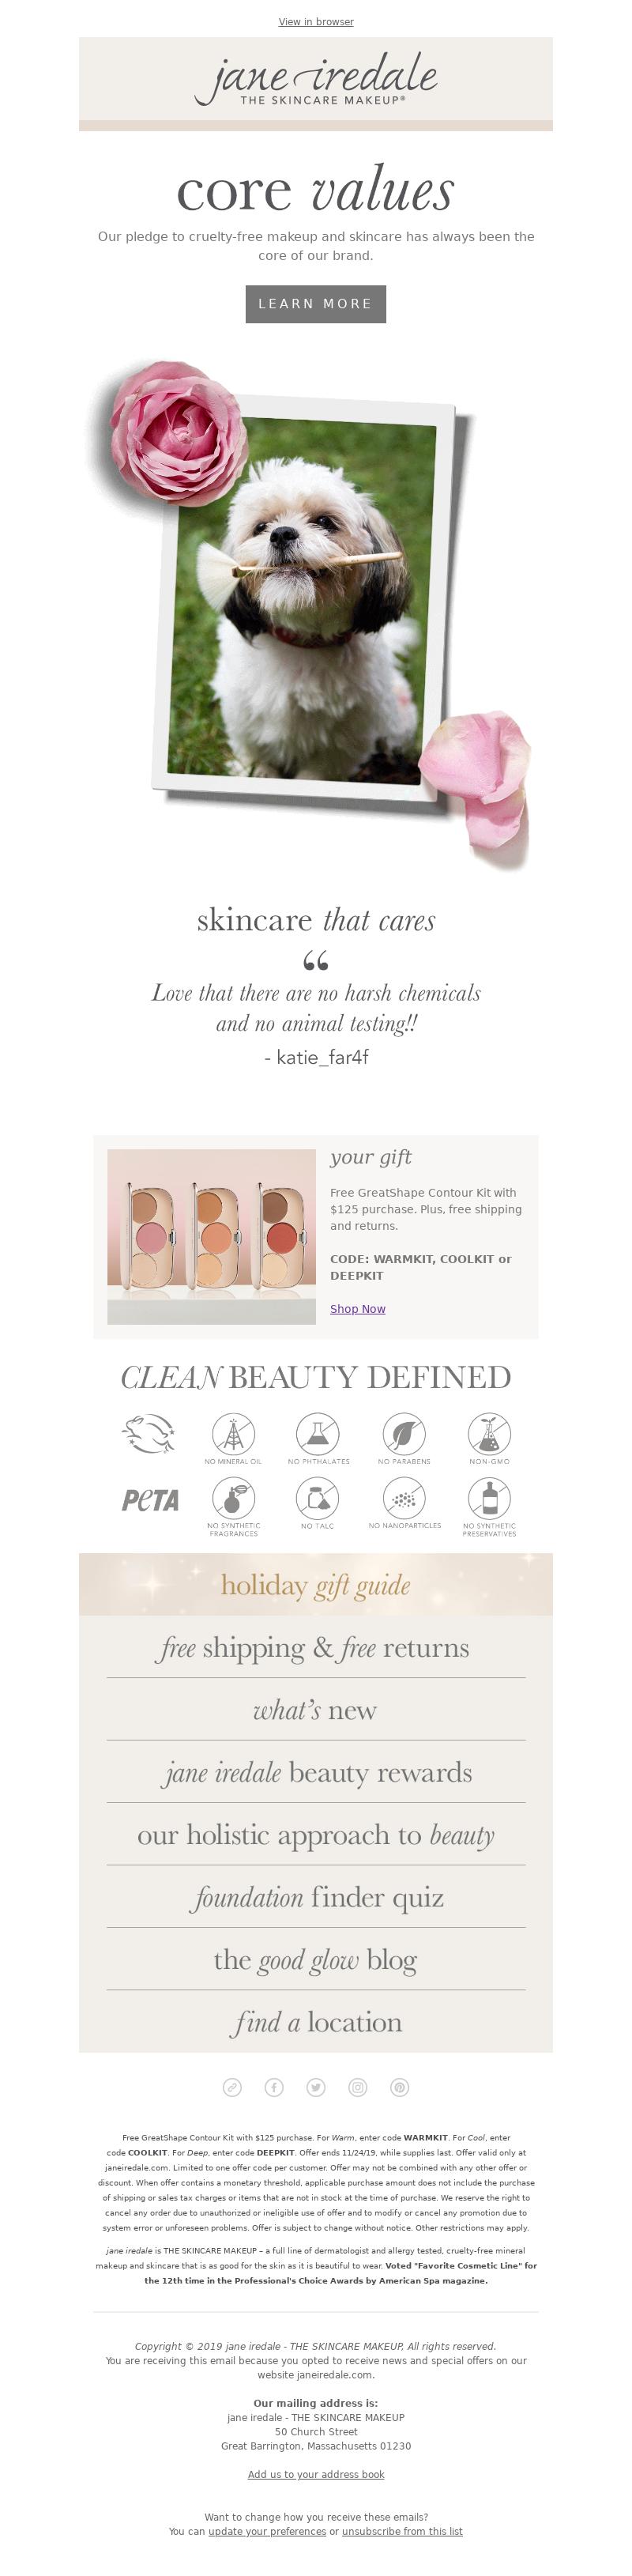 jane iredale - Free $49 Cruelty-Free Gift